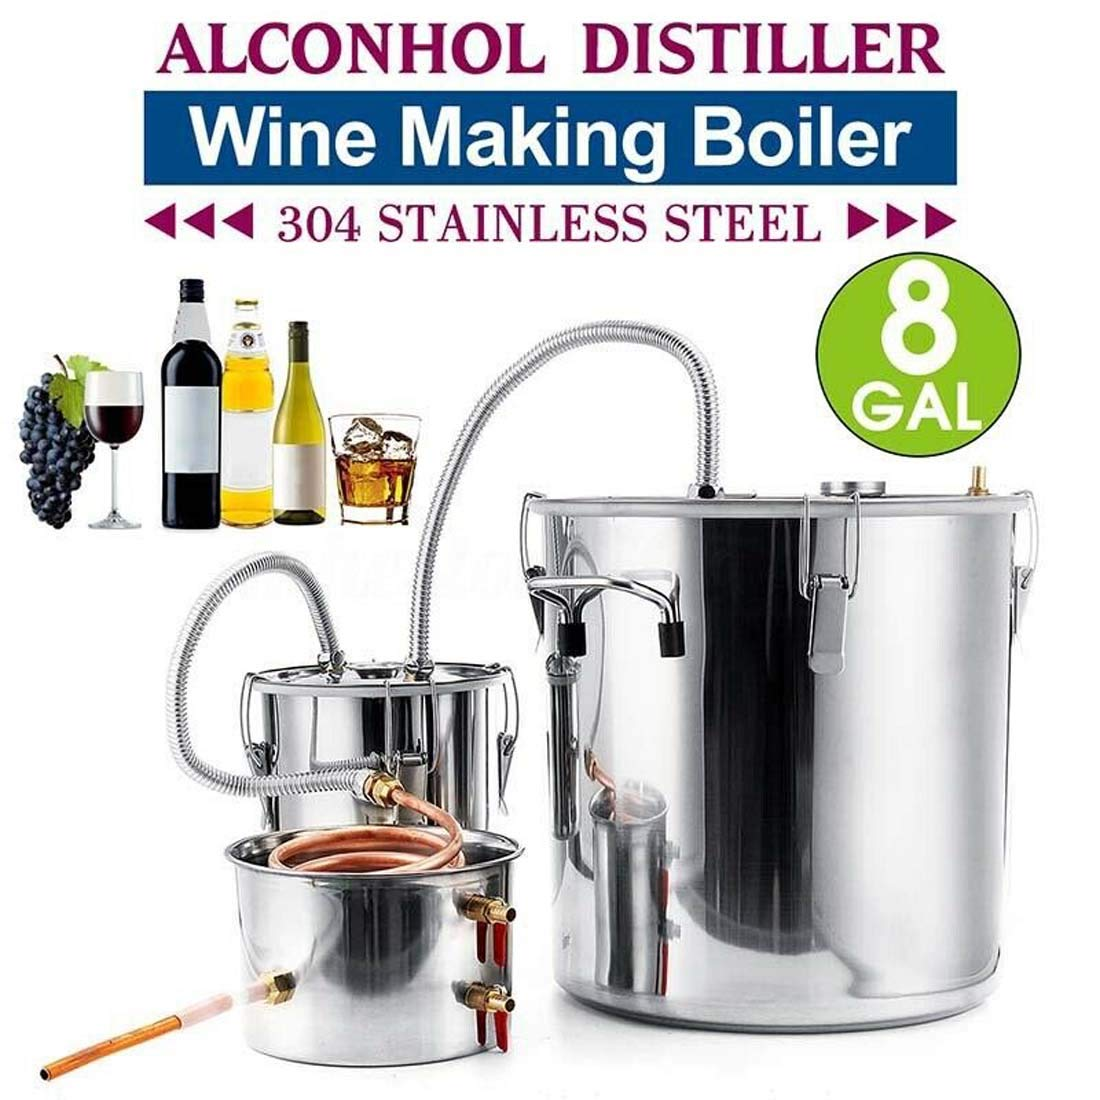 Vanell 8Gal Home Use Moonshine Still Brewing Stainless Steel Distiller Water Wine Alcohol Distiller Distilling Equipment Copper Tube Boiler Home DIY Brewing Kit